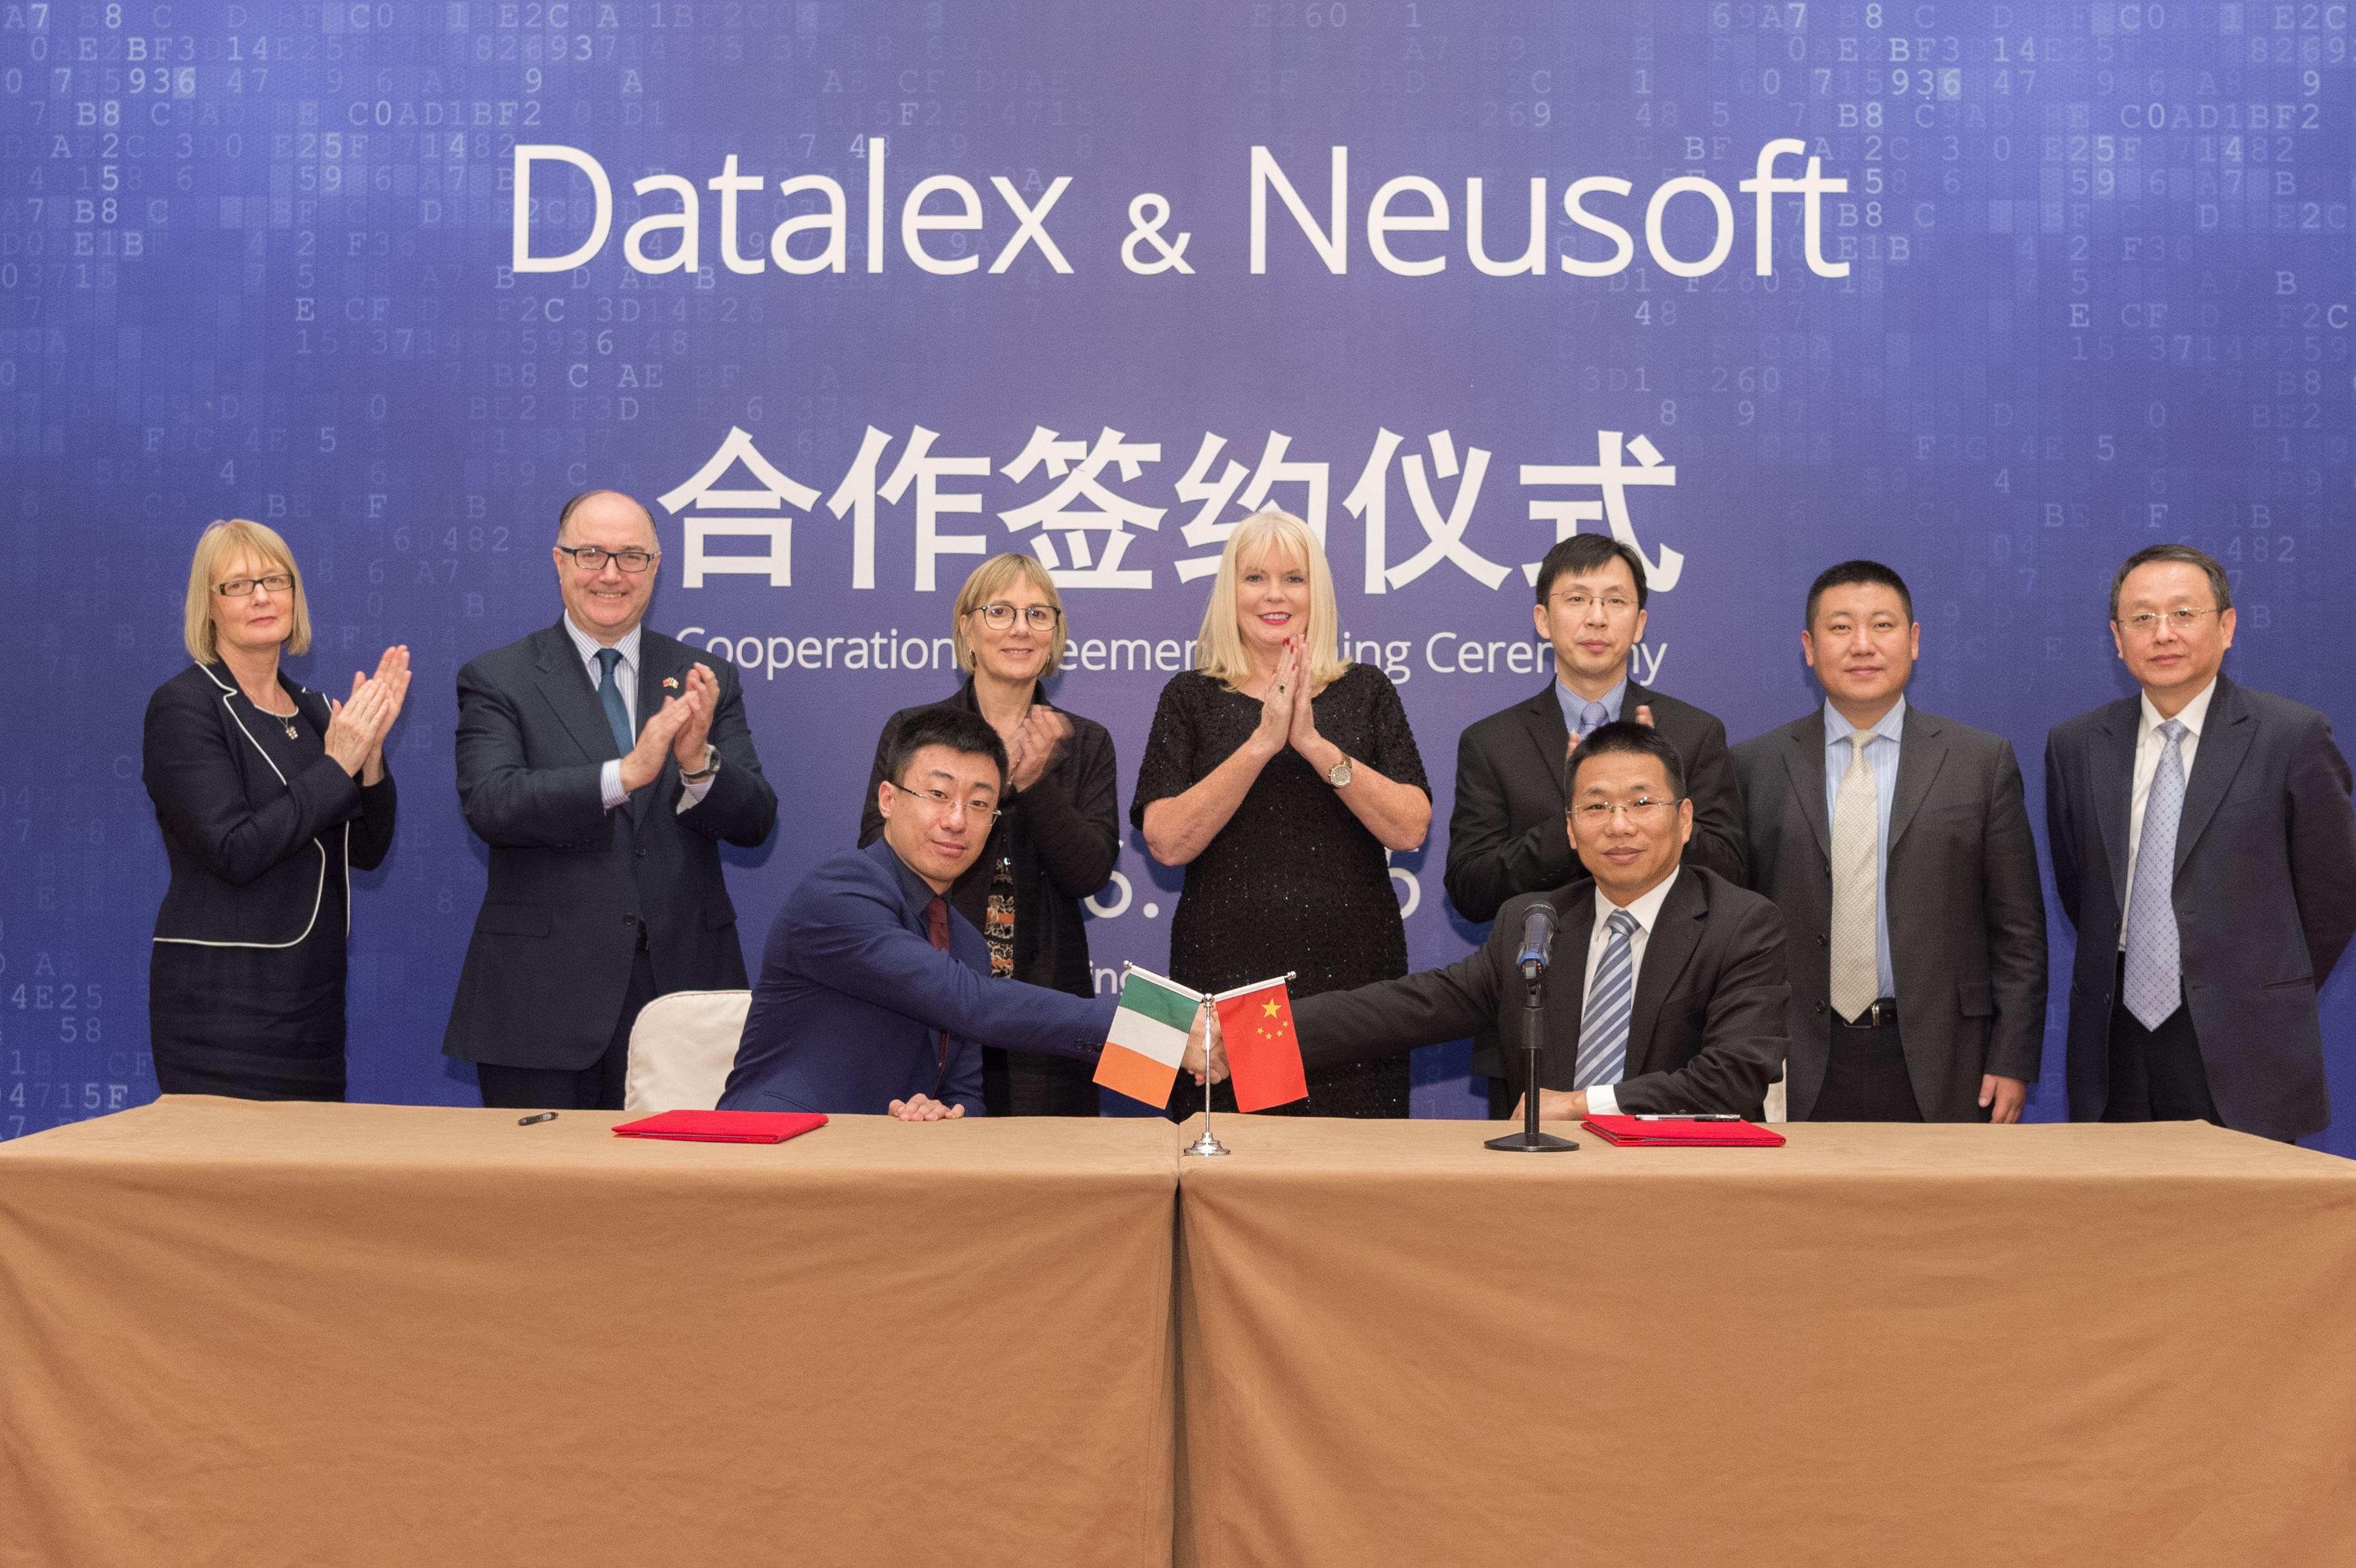 Datalex and Neusoft sign partnership agreement in Beijing